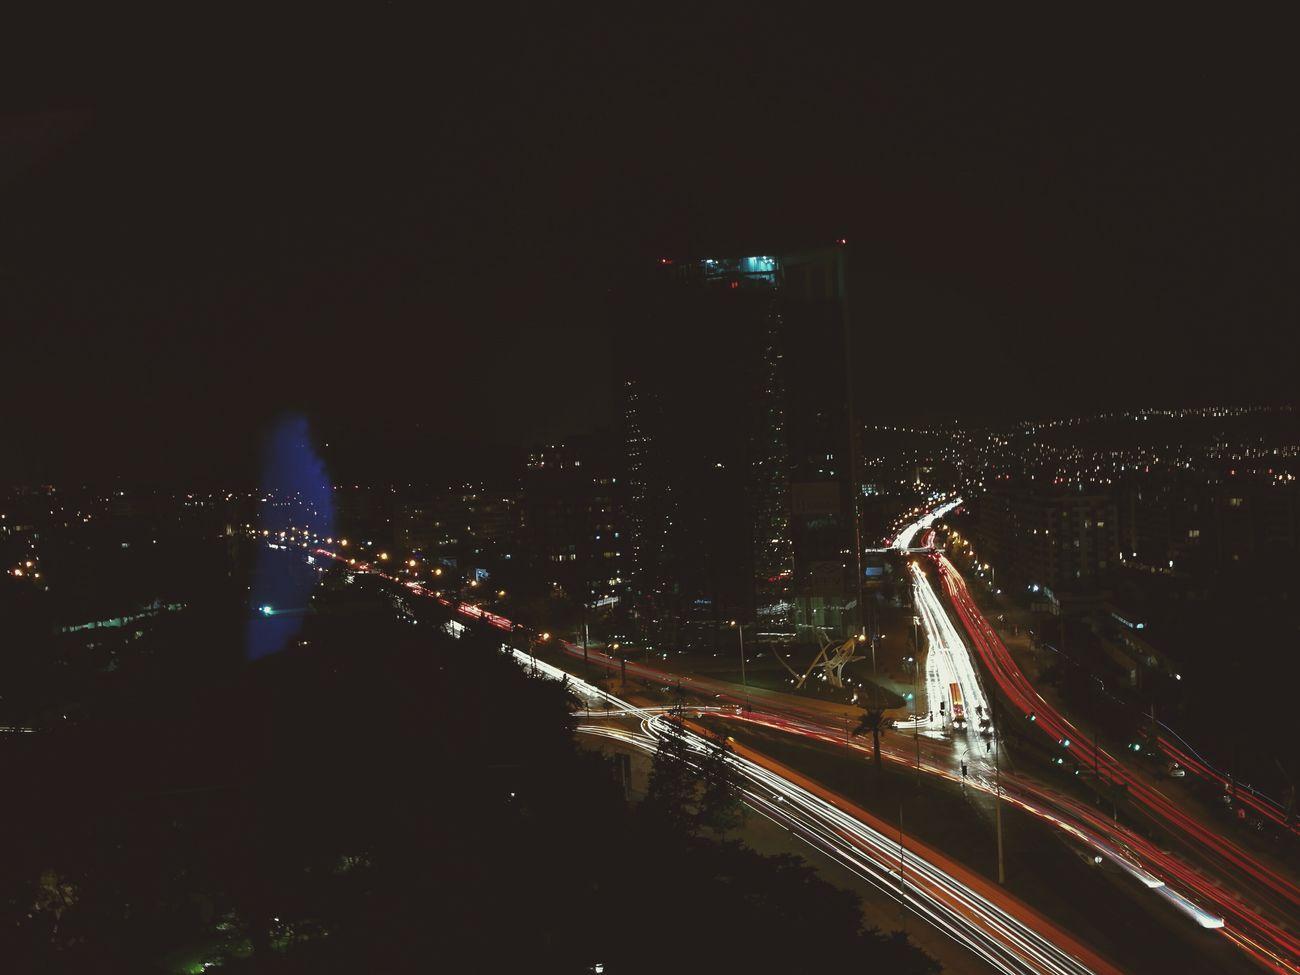 The beauty of Santiago city at night Night Illuminated City Nightlife First Eyeem Photo